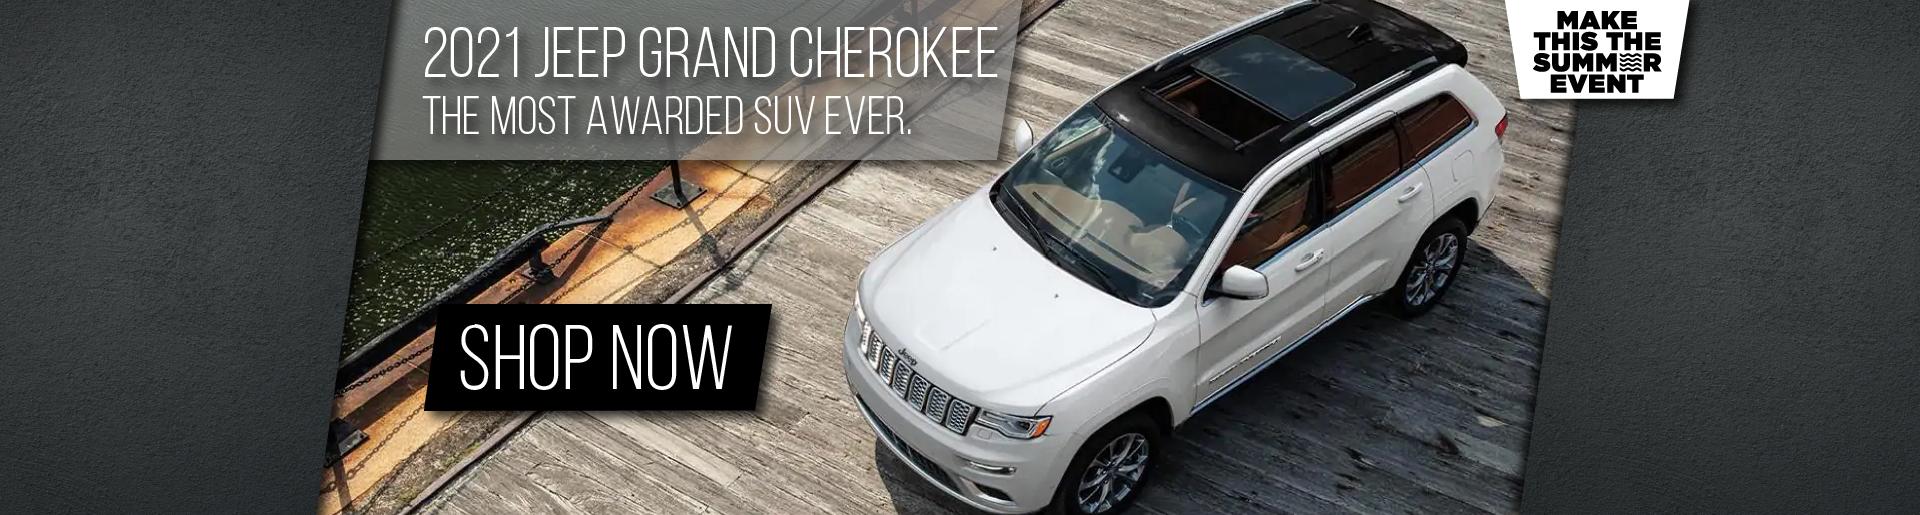 August 2021 Jeep Grand Cherokee Generic